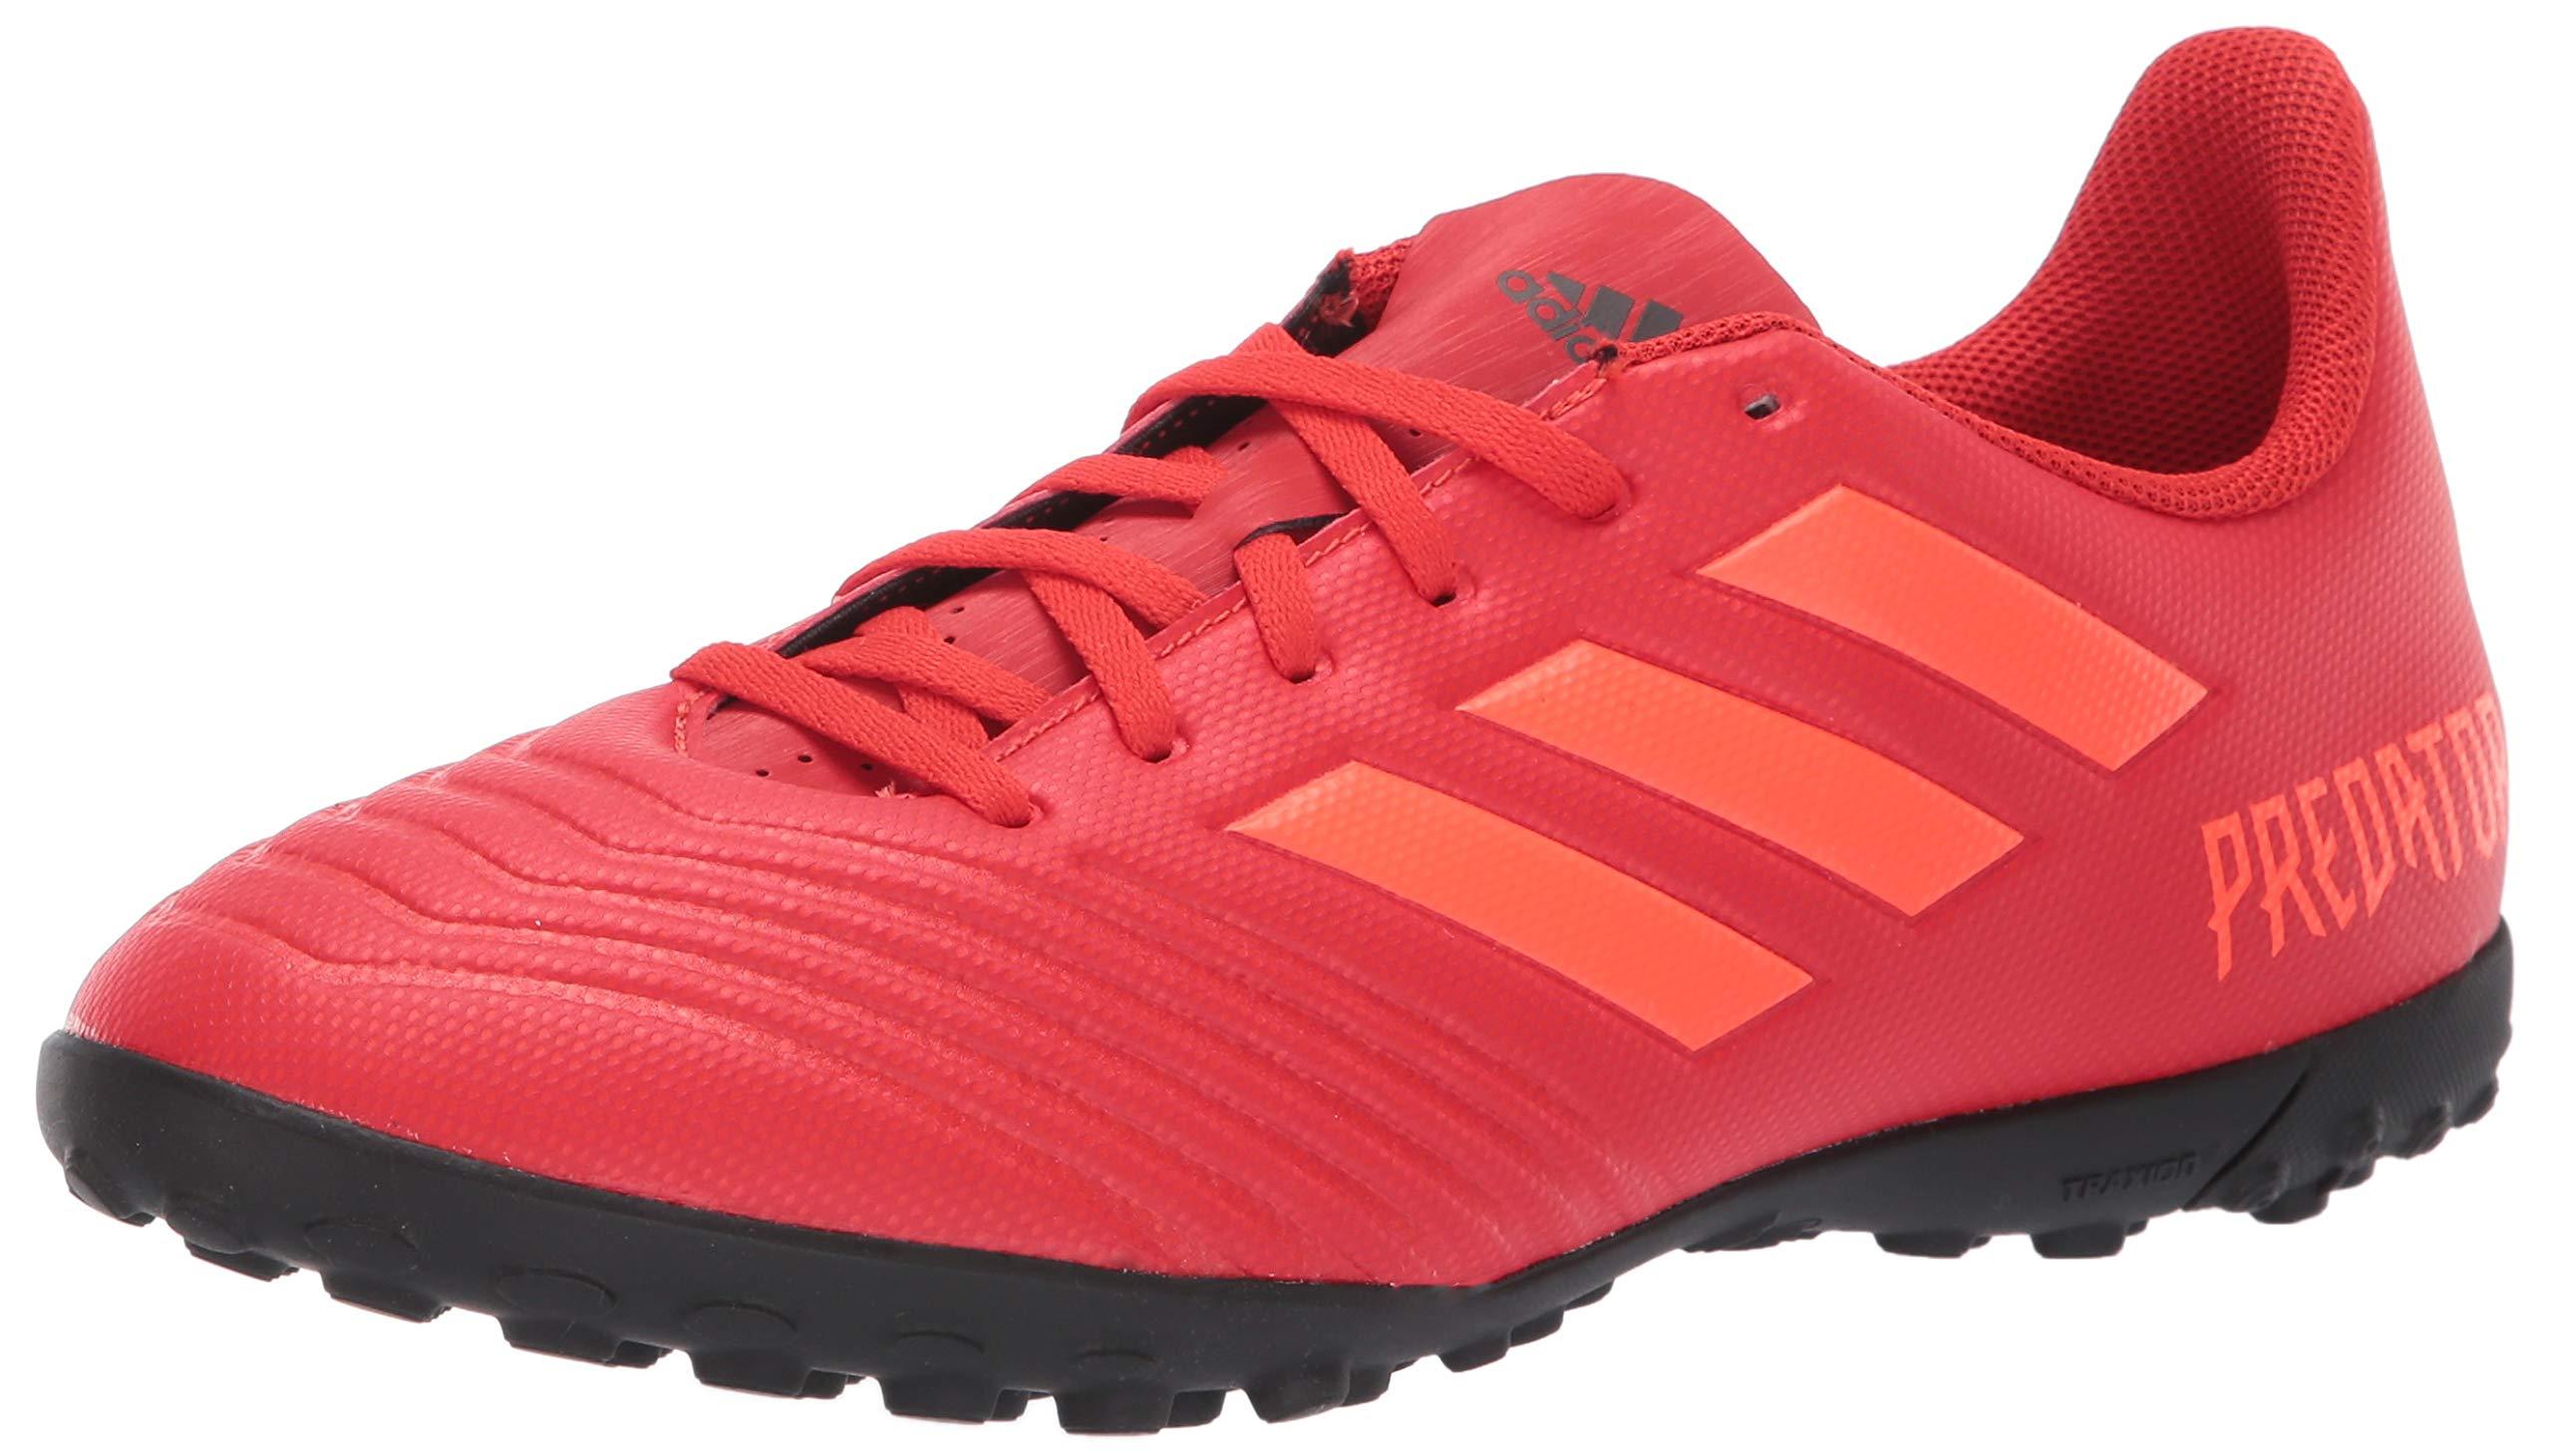 adidas Men's Predator 19.4 Turf, Active Solar red/Black, 8 M US